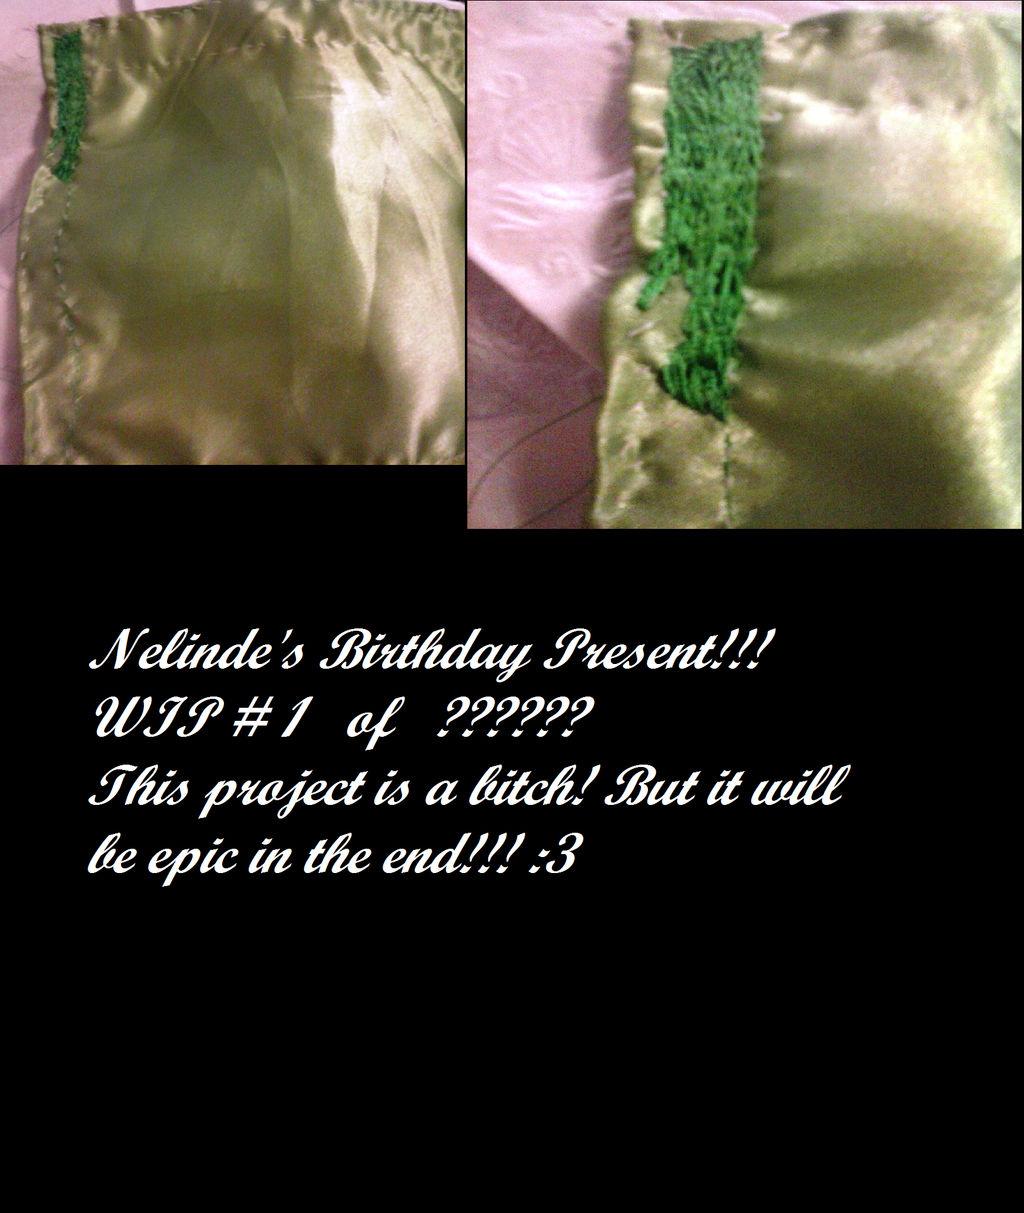 Nelinde's Birthday Present WIP # 1 of ??????? by ravinniaofcreed